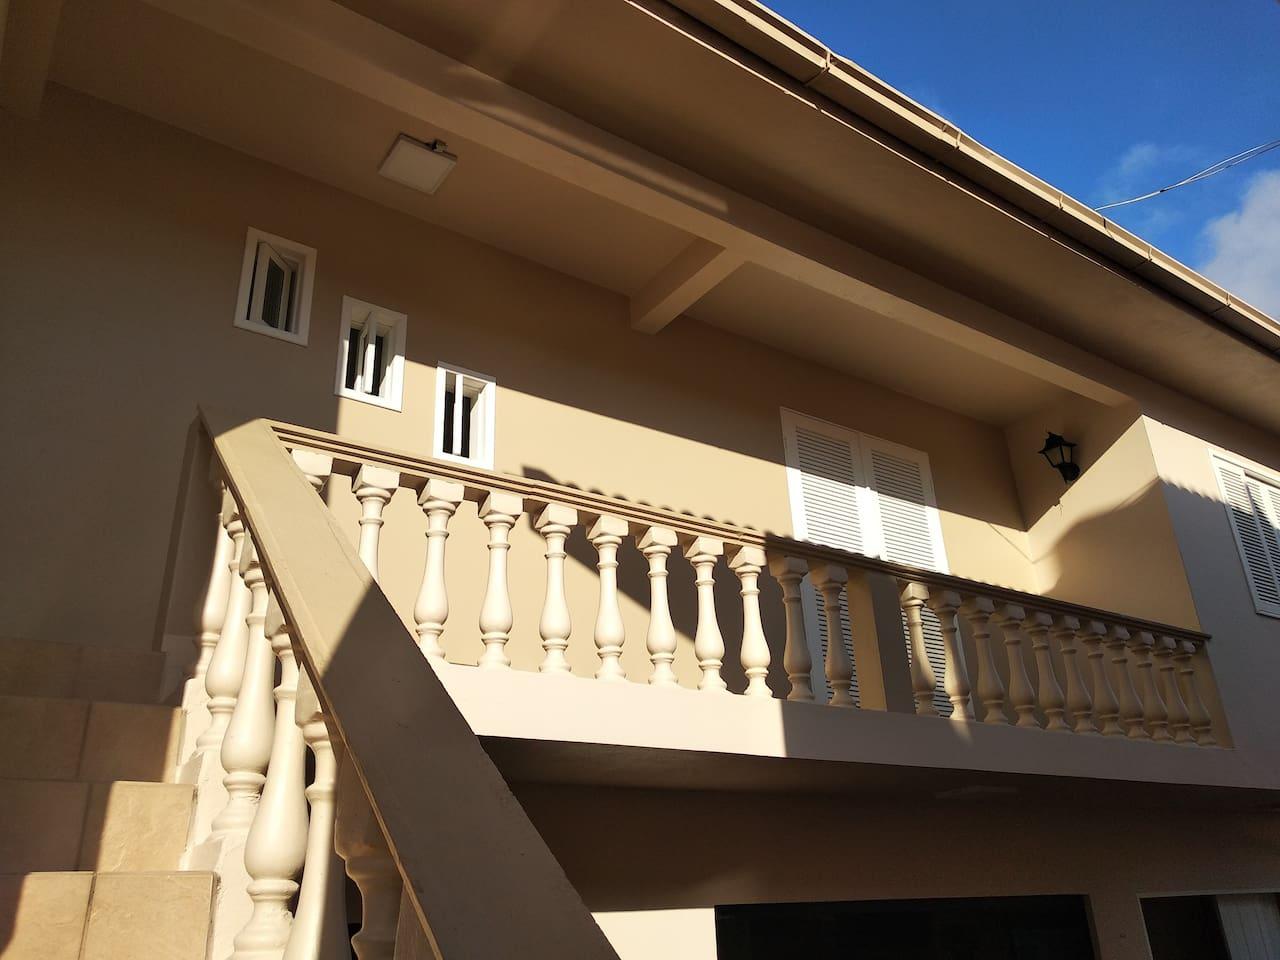 Casa Edícula. No piso inferior está localizada a área social. Entrada do imóvel independente.